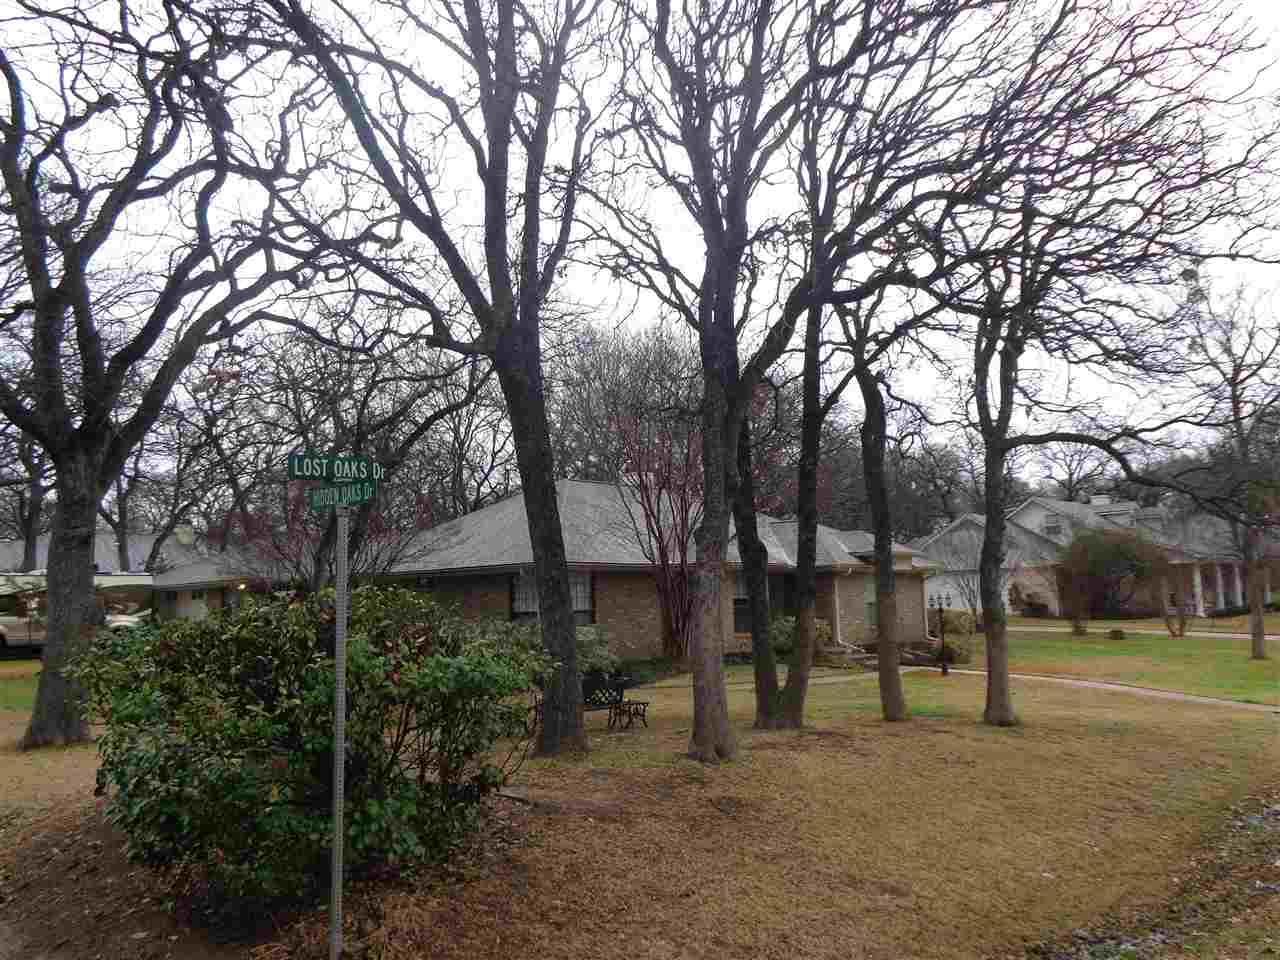 101 Lost Oaks Dr Waco Tx 76705 Mls 168269 Magnolia